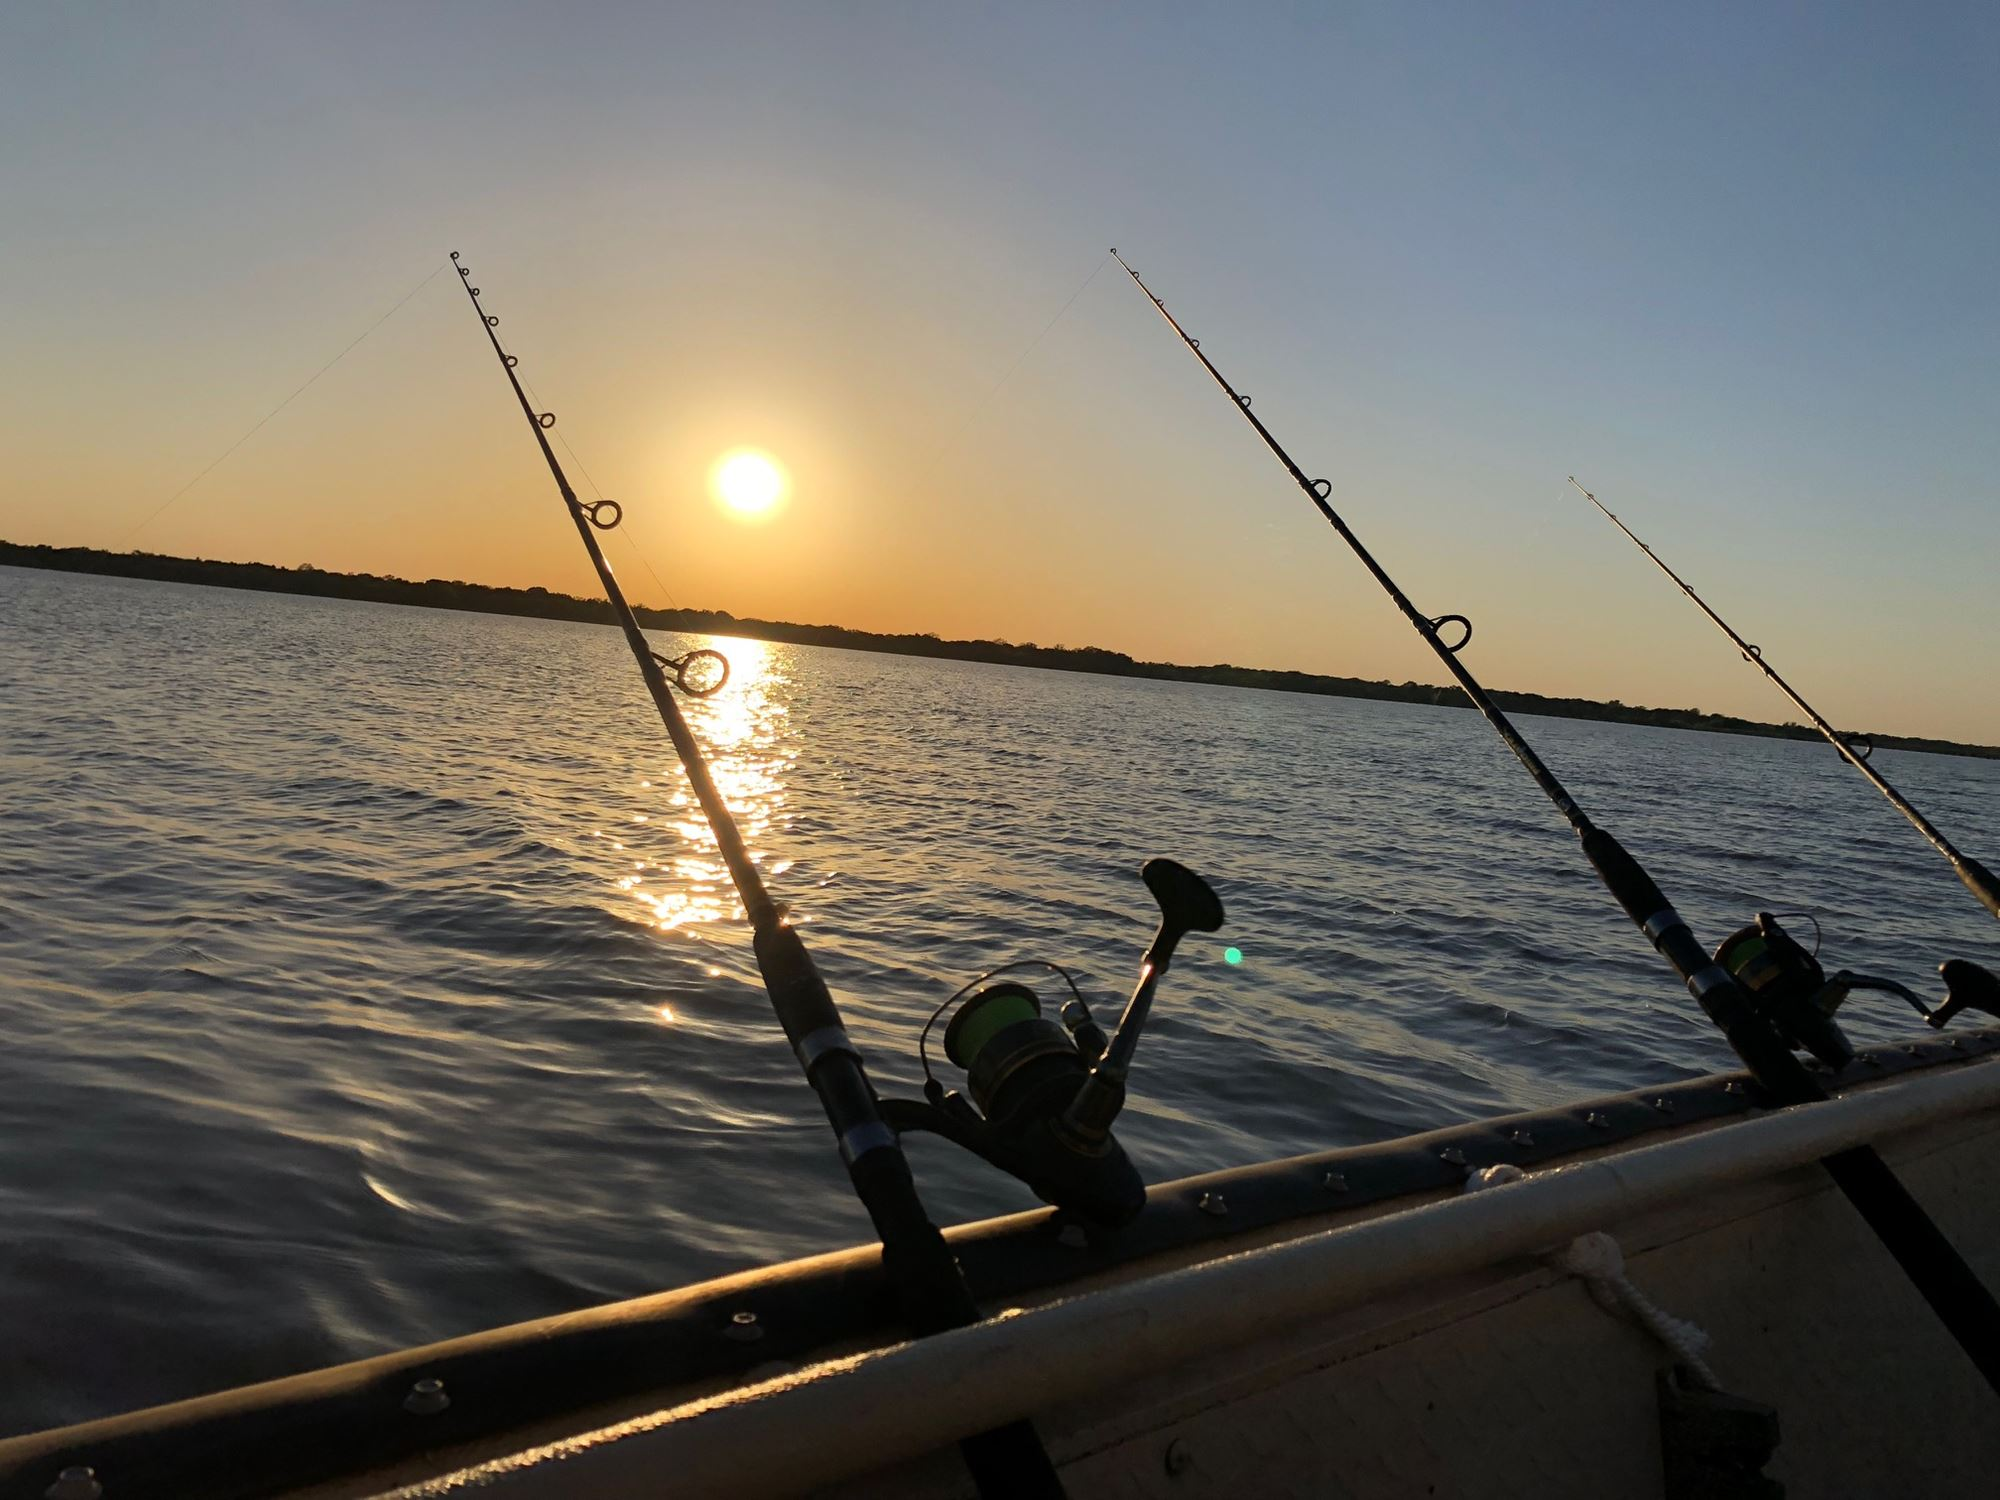 Barracho de Pescado Fishing Tournament